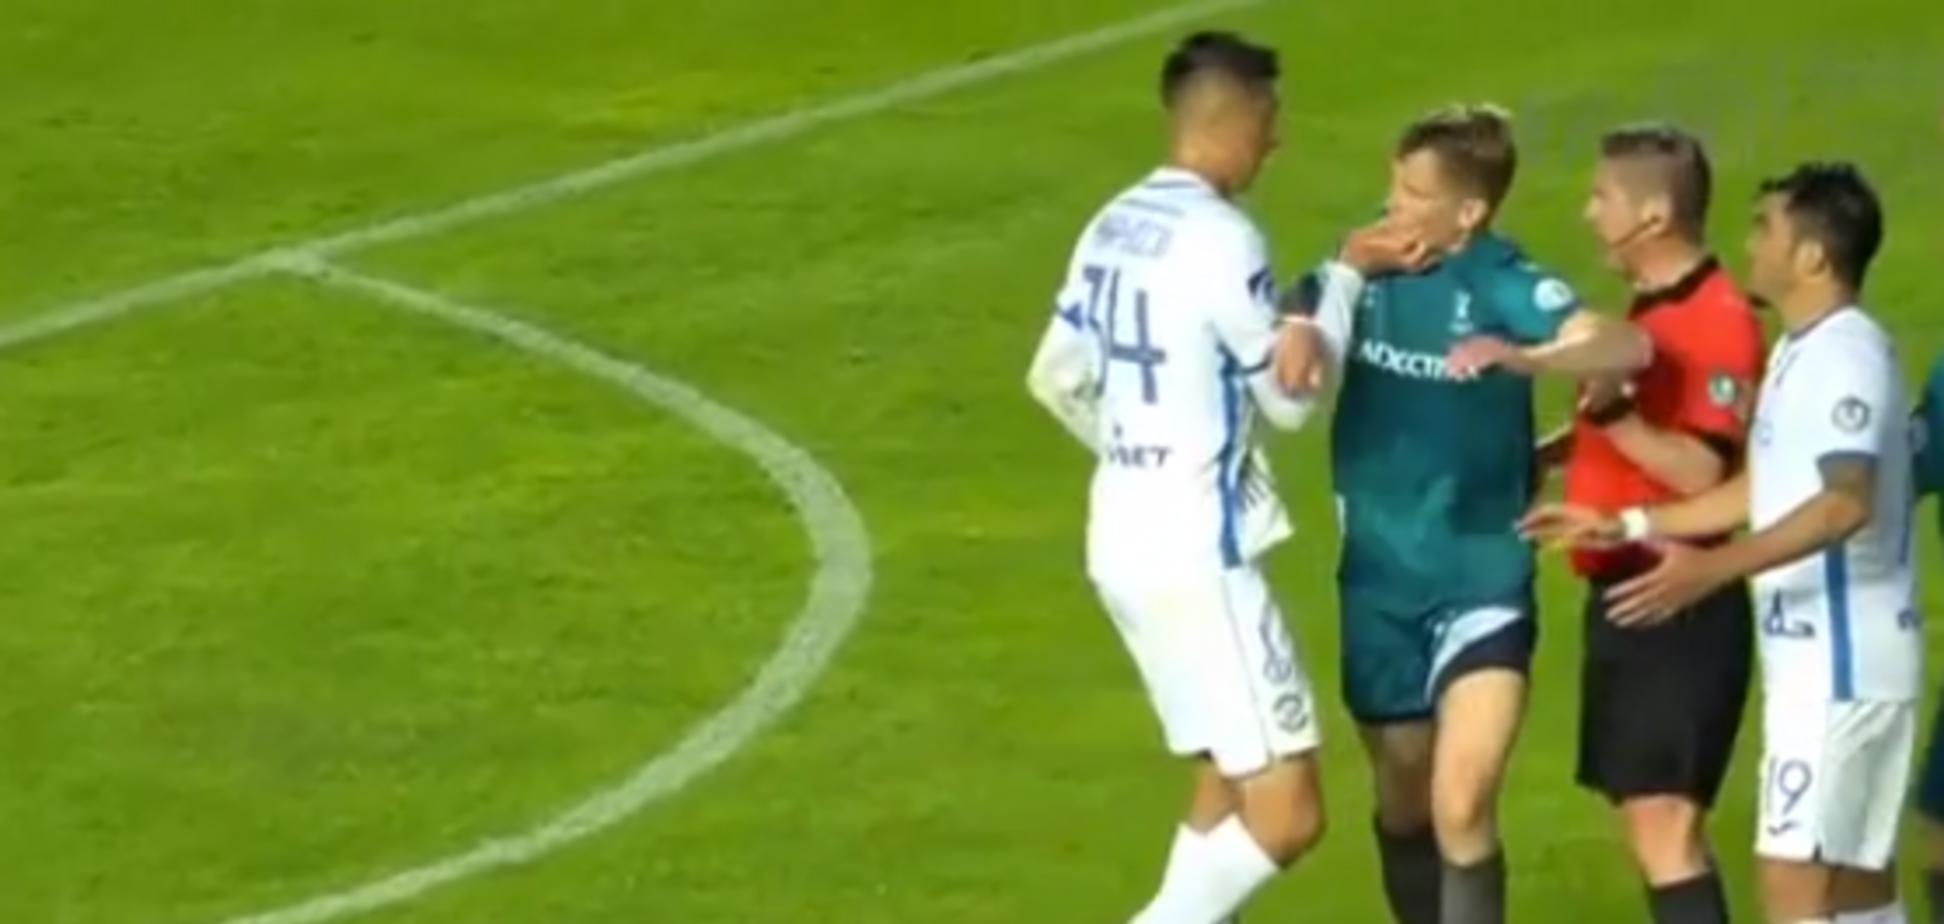 Евгений Хачериди схватил соперника за лицо